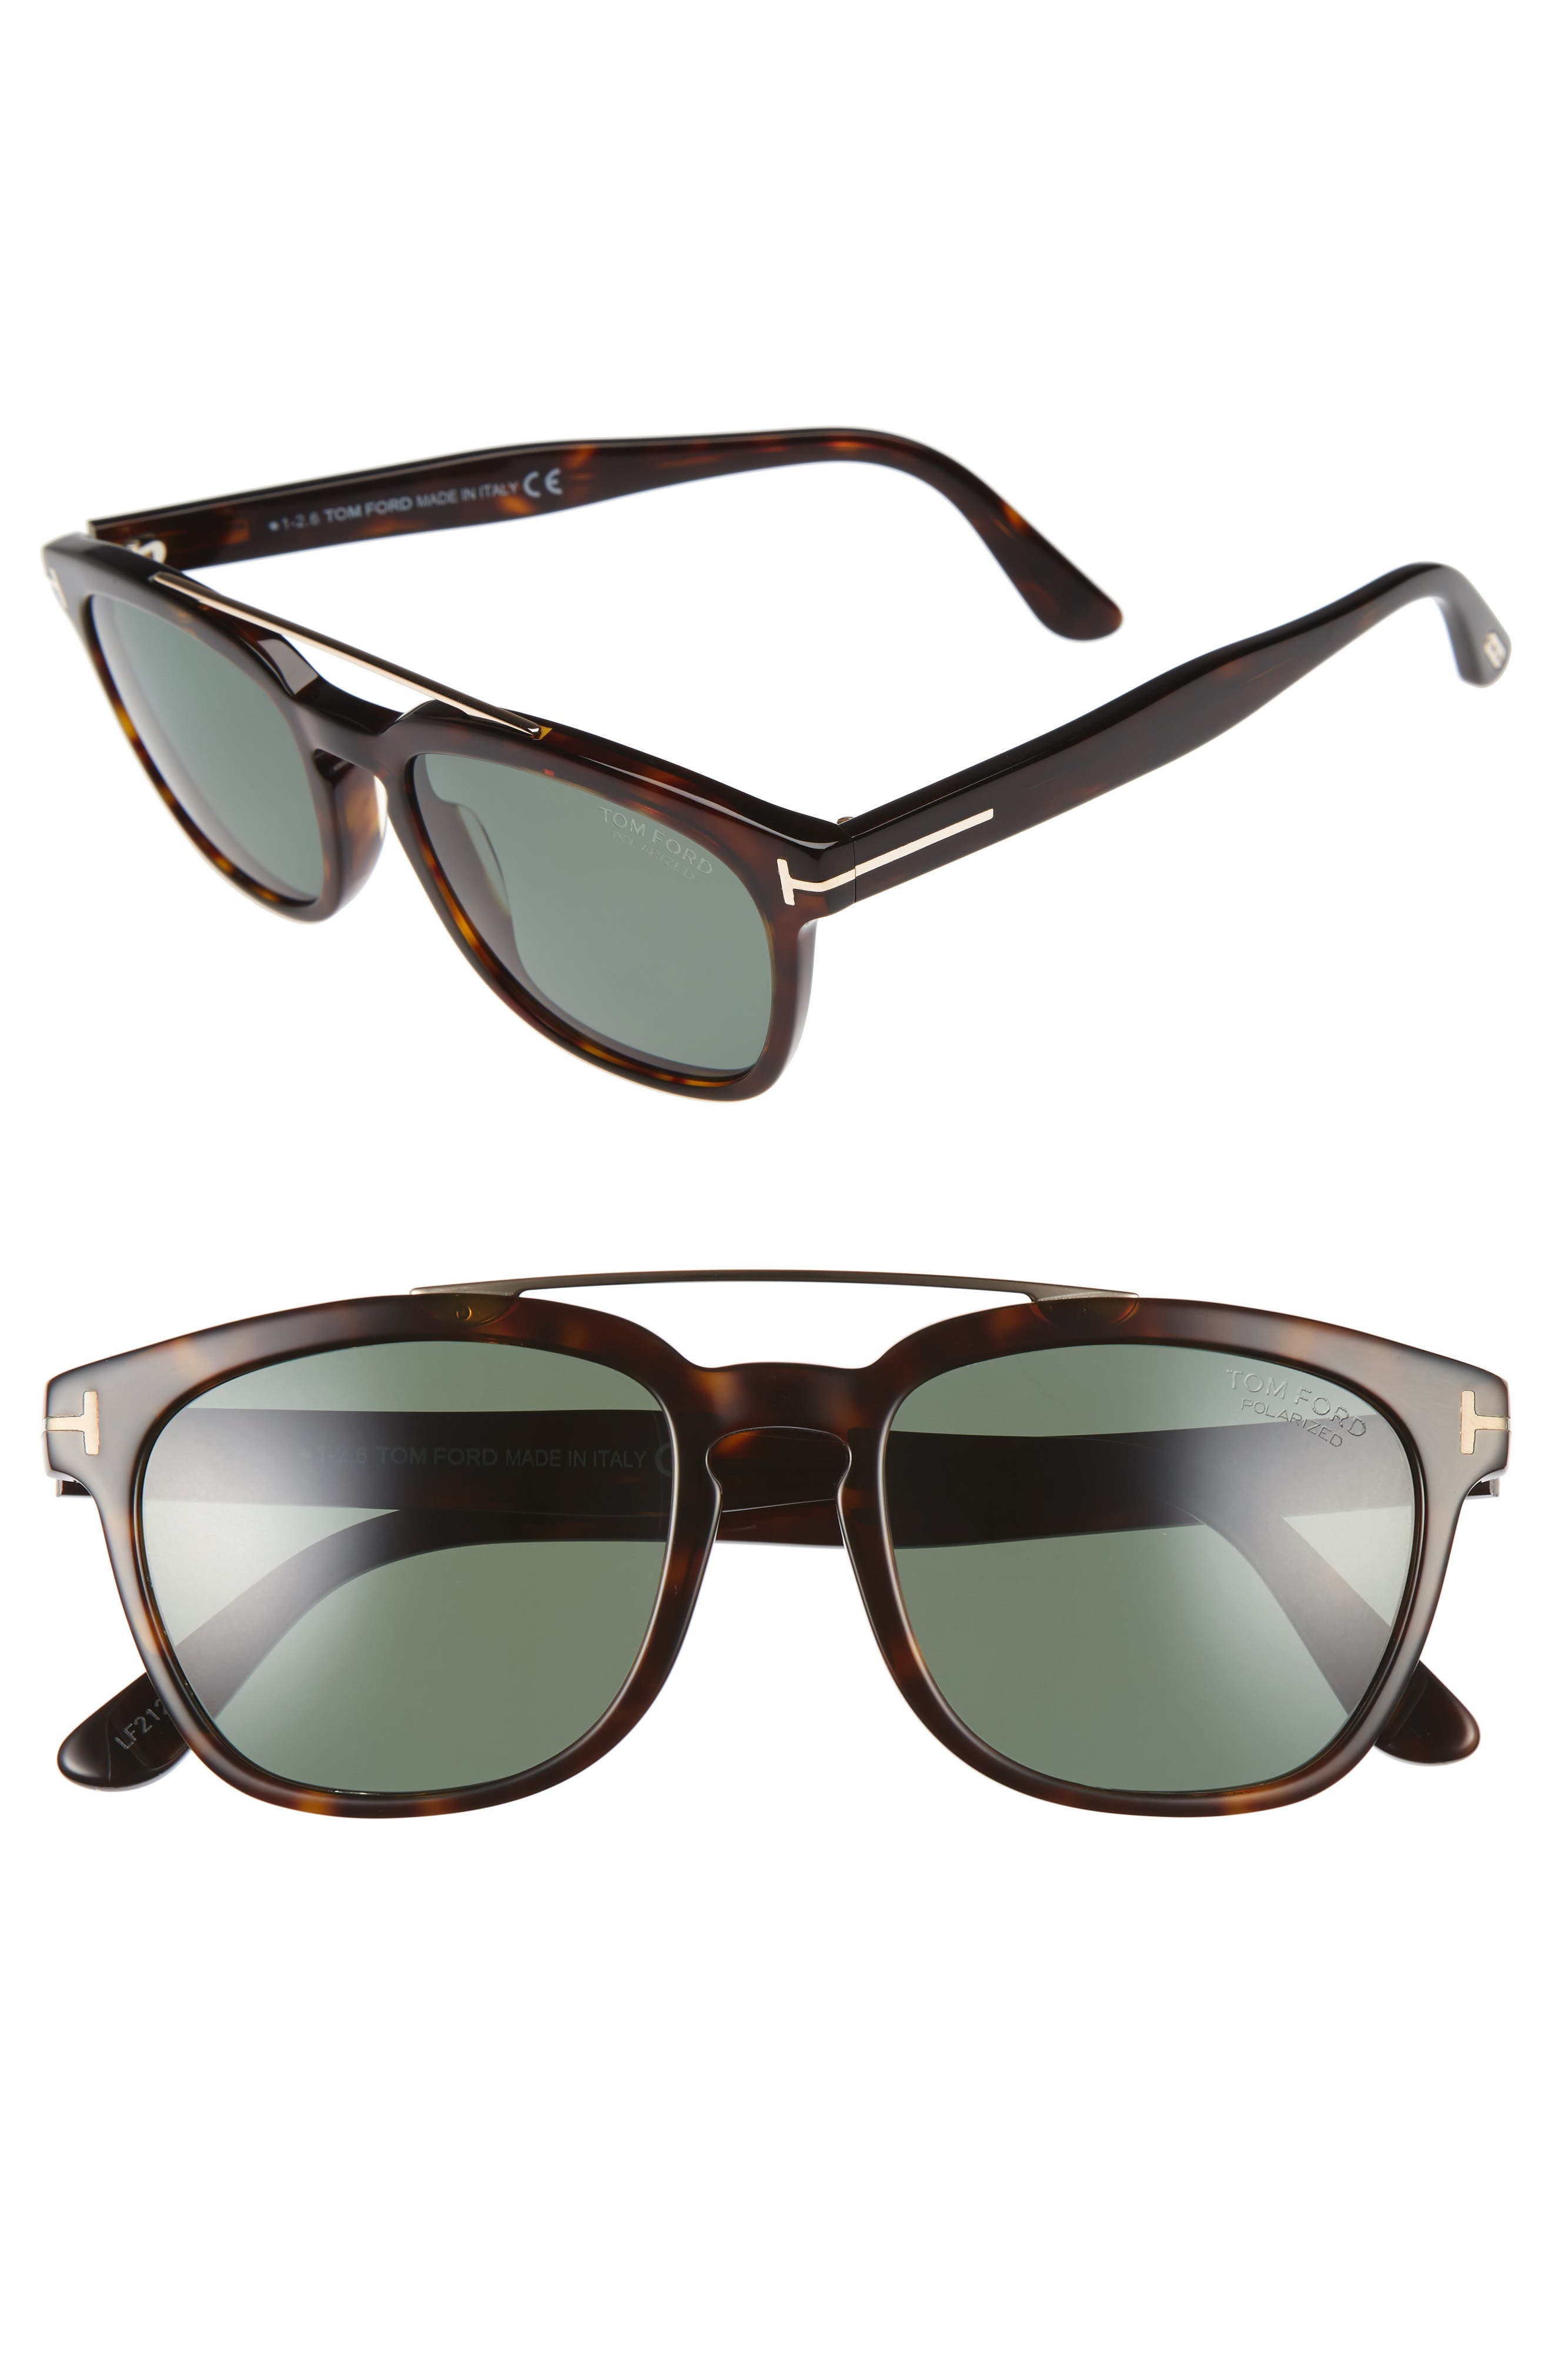 Holt 54mm Polarized Sunglasses,                         Main,                         color, Dark Havana/ Green